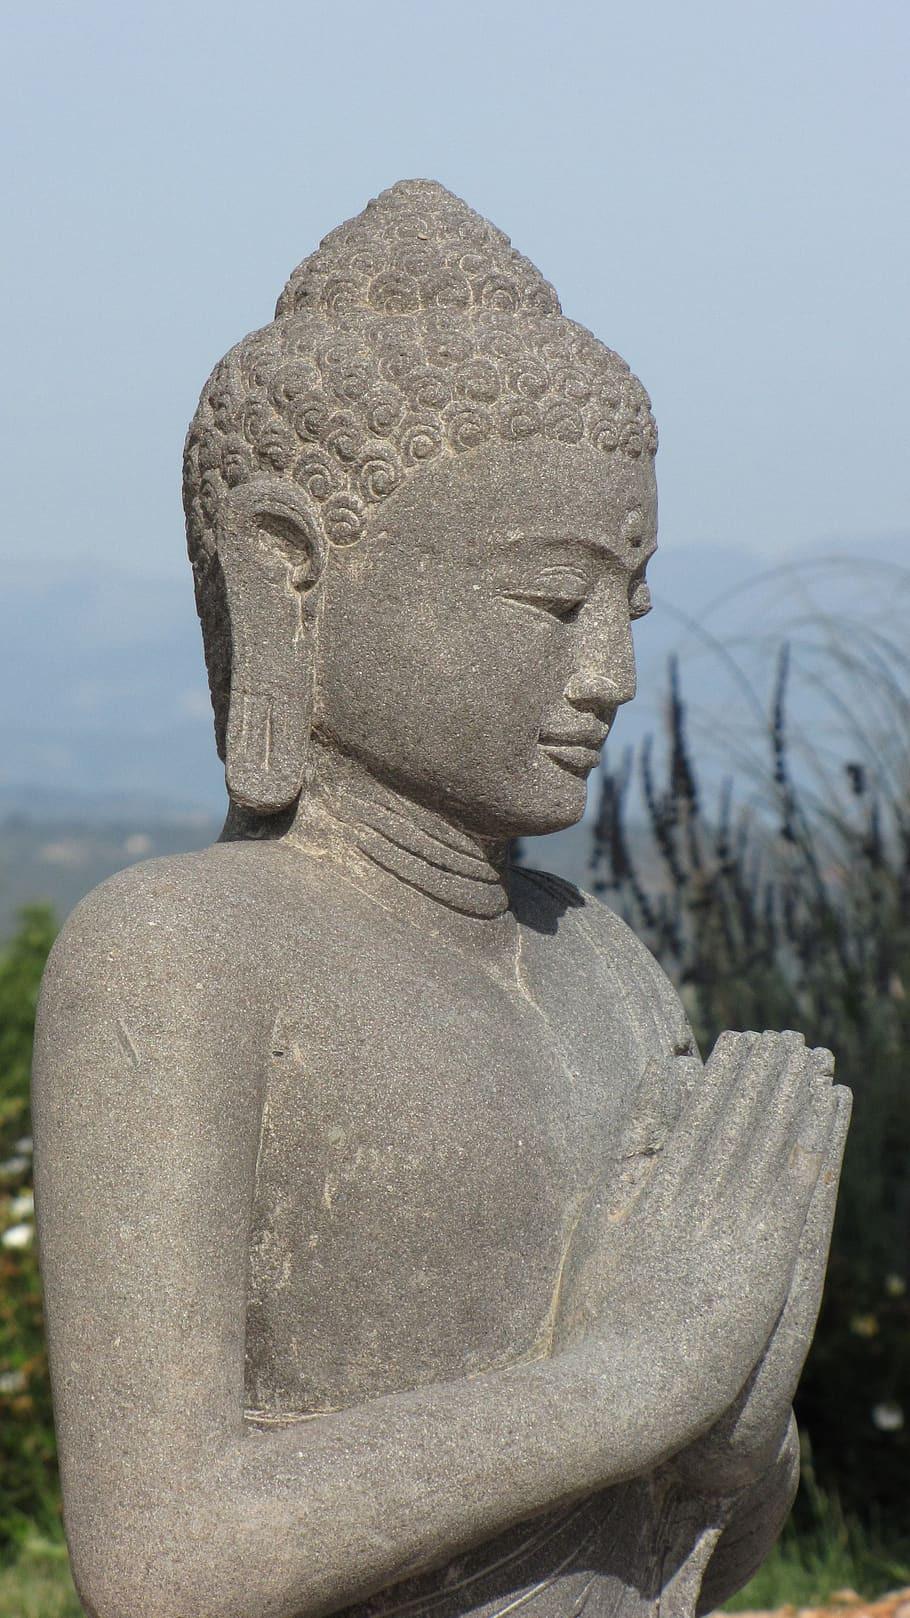 buddha-prayer-h-asia-stone-figure-meditation.jpg